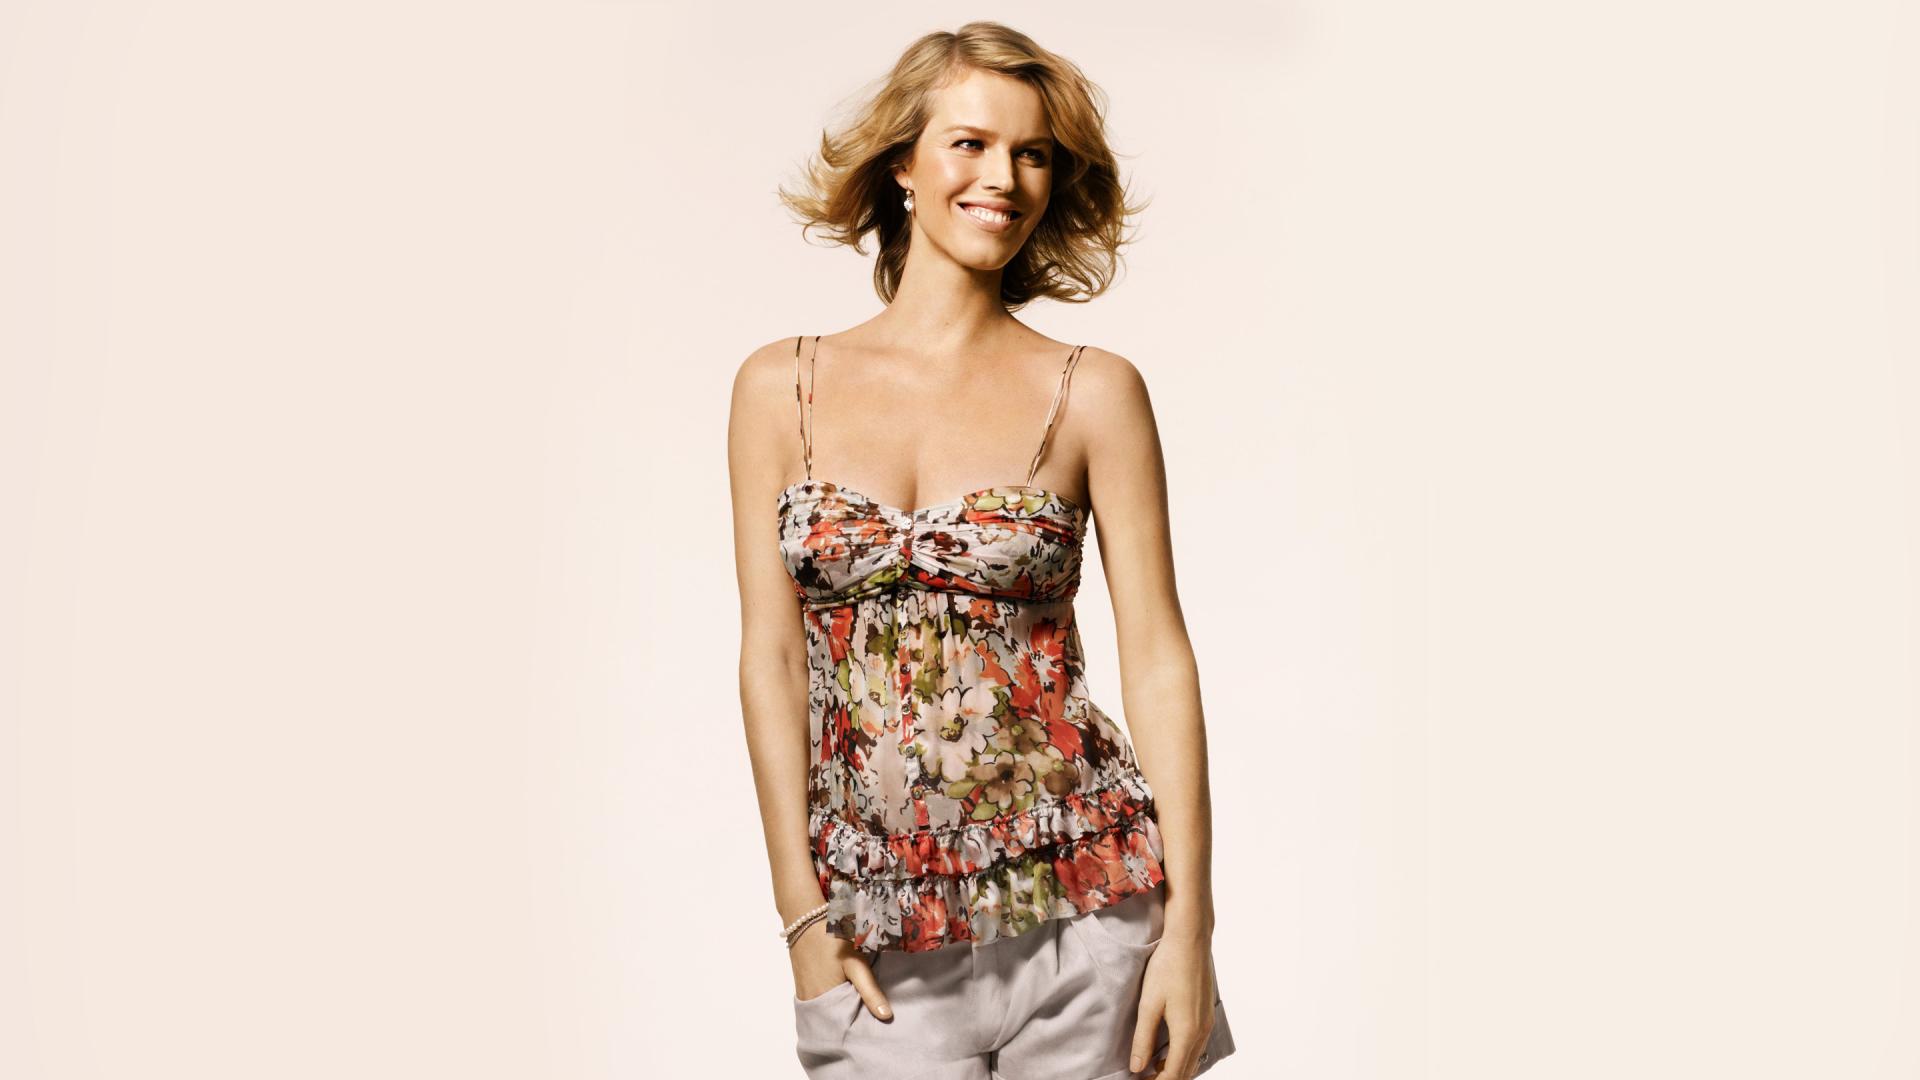 standing eva herzigova model smiling simple background blonde women